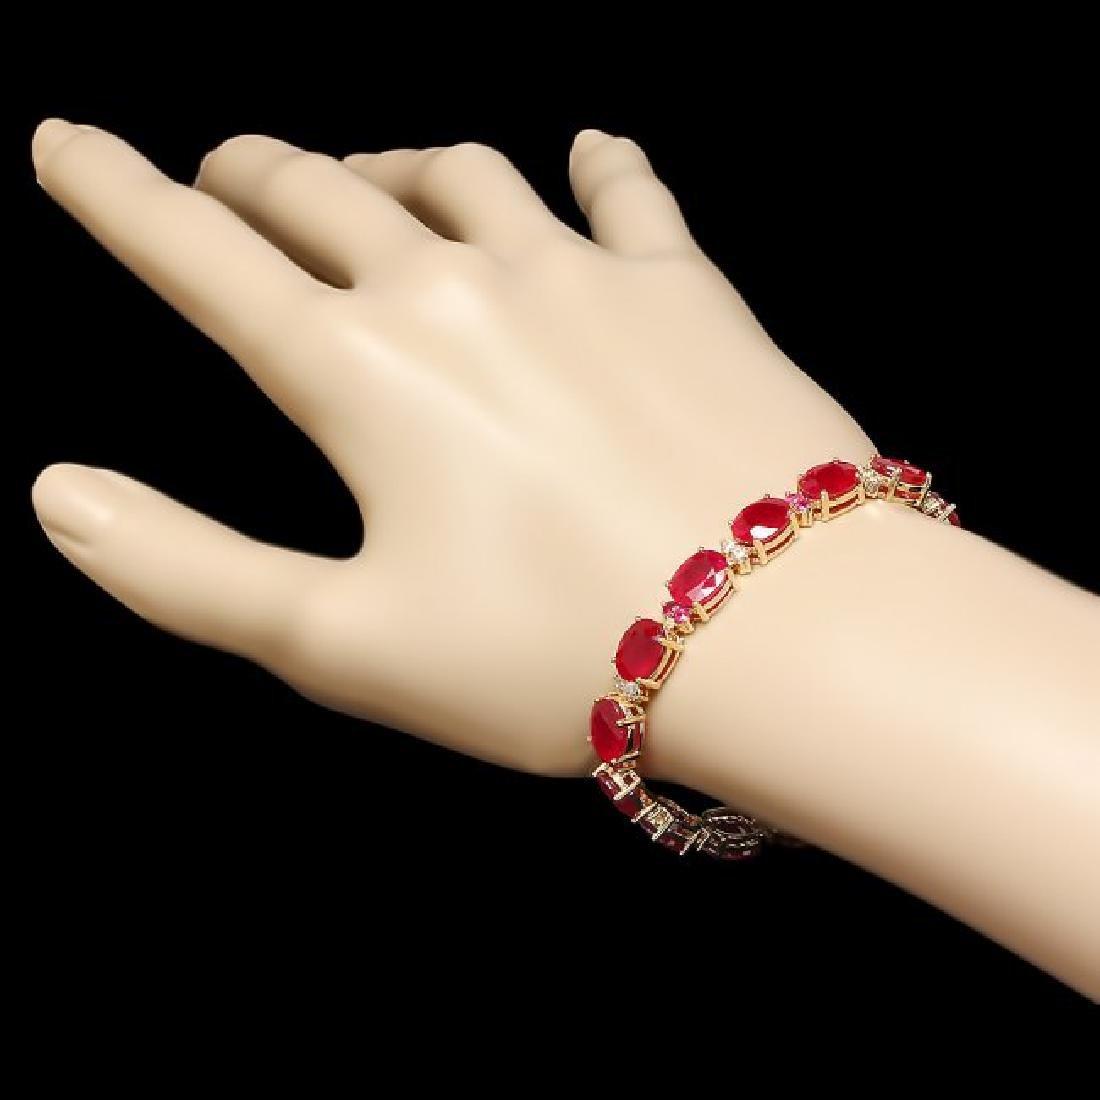 14k Gold 39.7ct Ruby 0.70ct Diamond Bracelet - 5